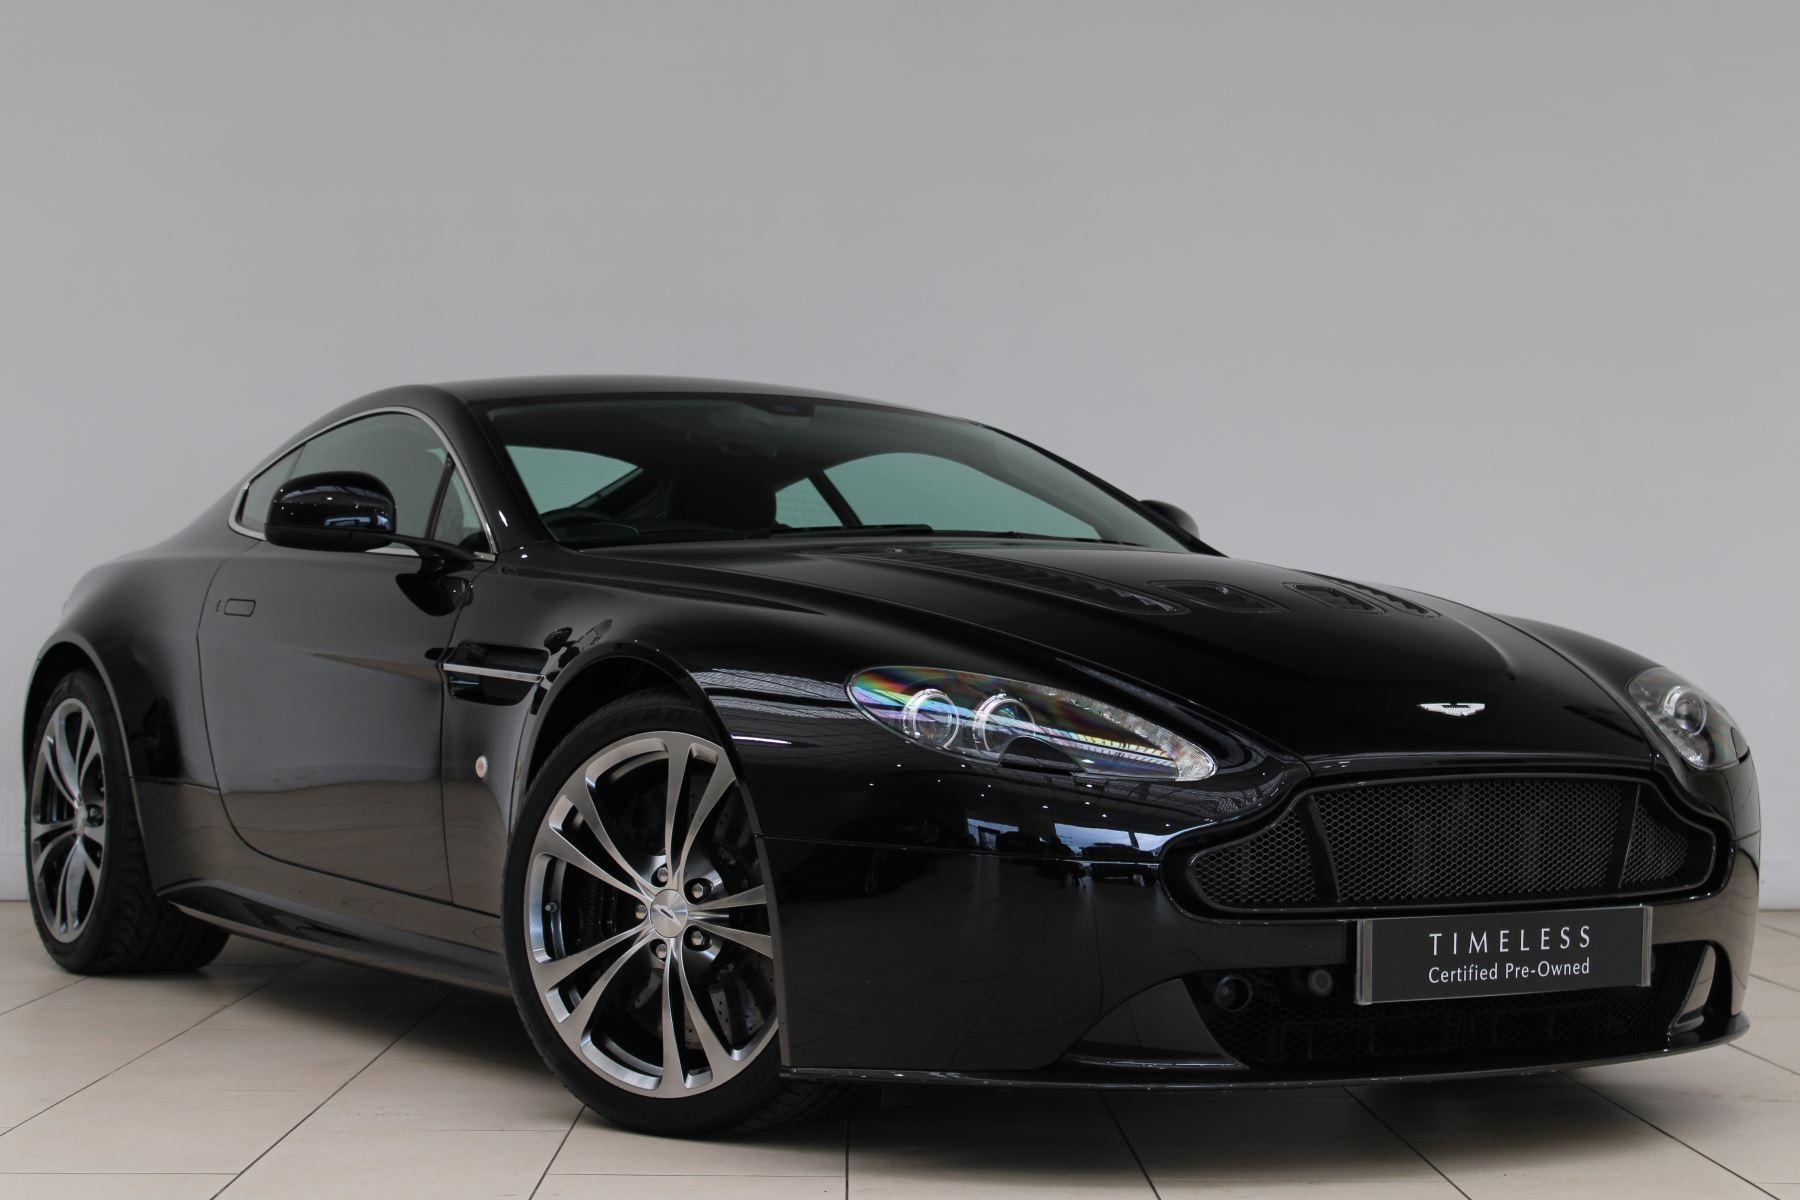 Aston Martin V12 Vantage S S 2dr Sportshift III 5.9 Automatic 3 door Coupe